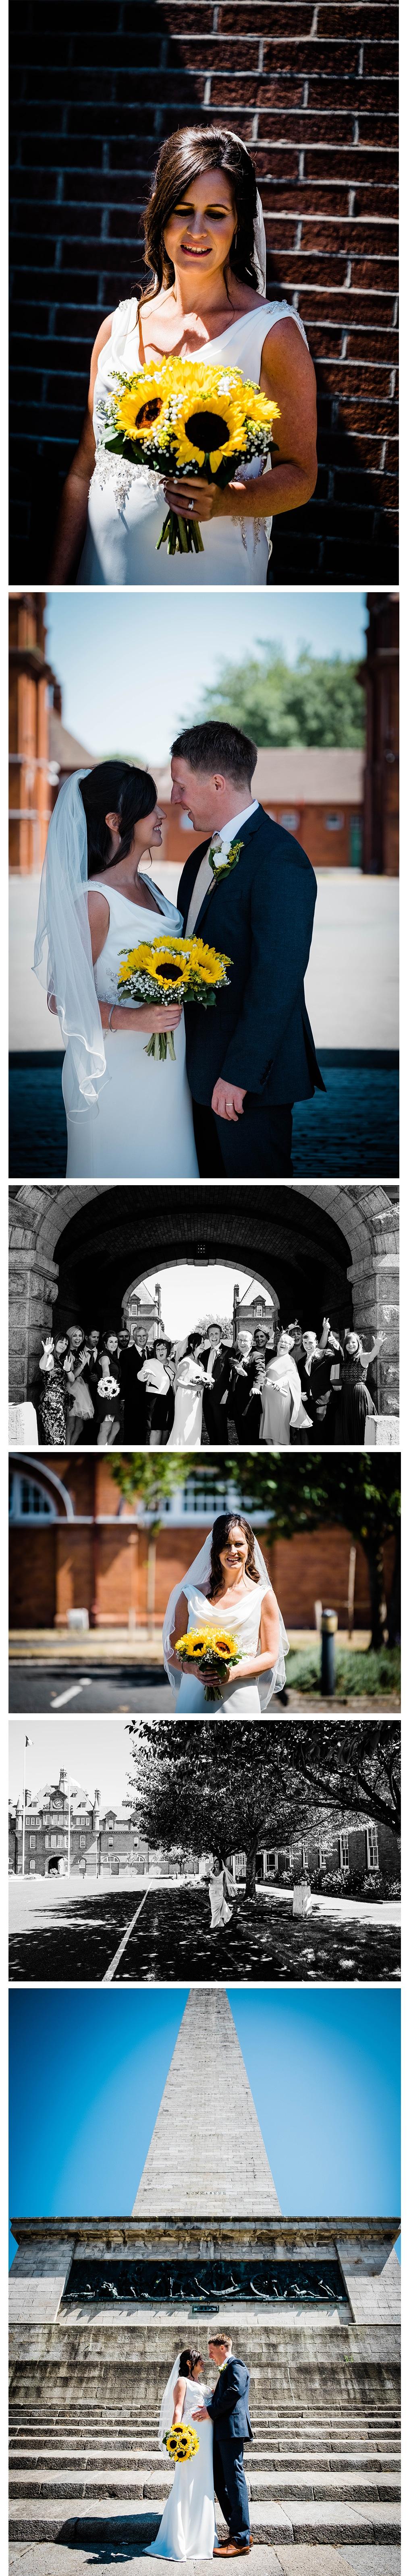 professional wedding photographer Ireland, top destination wedding photographer Dublin, best bridal photography in Dublin, candid wedding photography, intimate wedding ceremony, Wedding at the Mckee Barrack, wedding at Phoenix Park